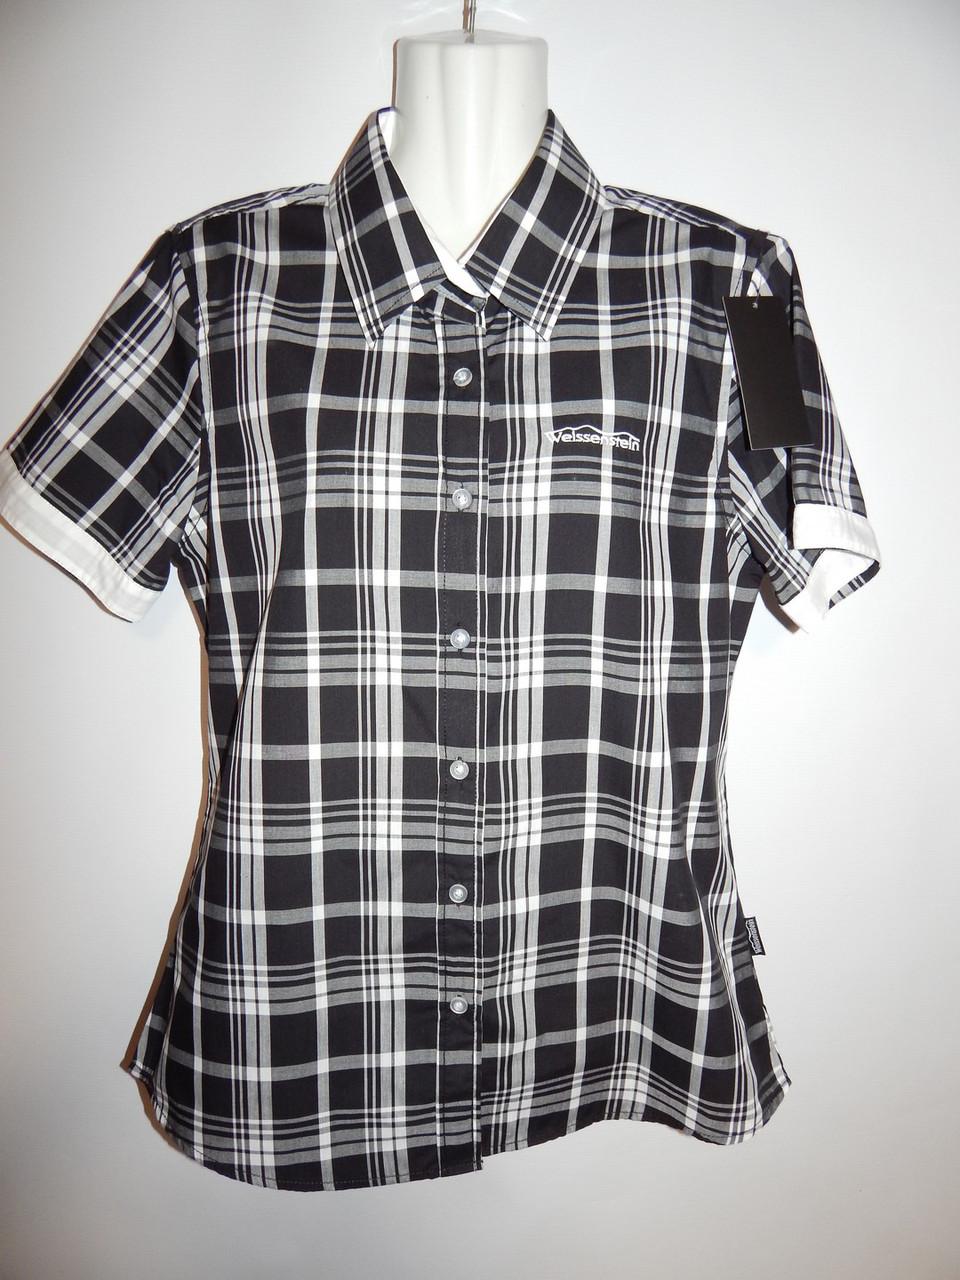 Блуза -рубашка фирменная женская Weissenstein 48-50р.179ж